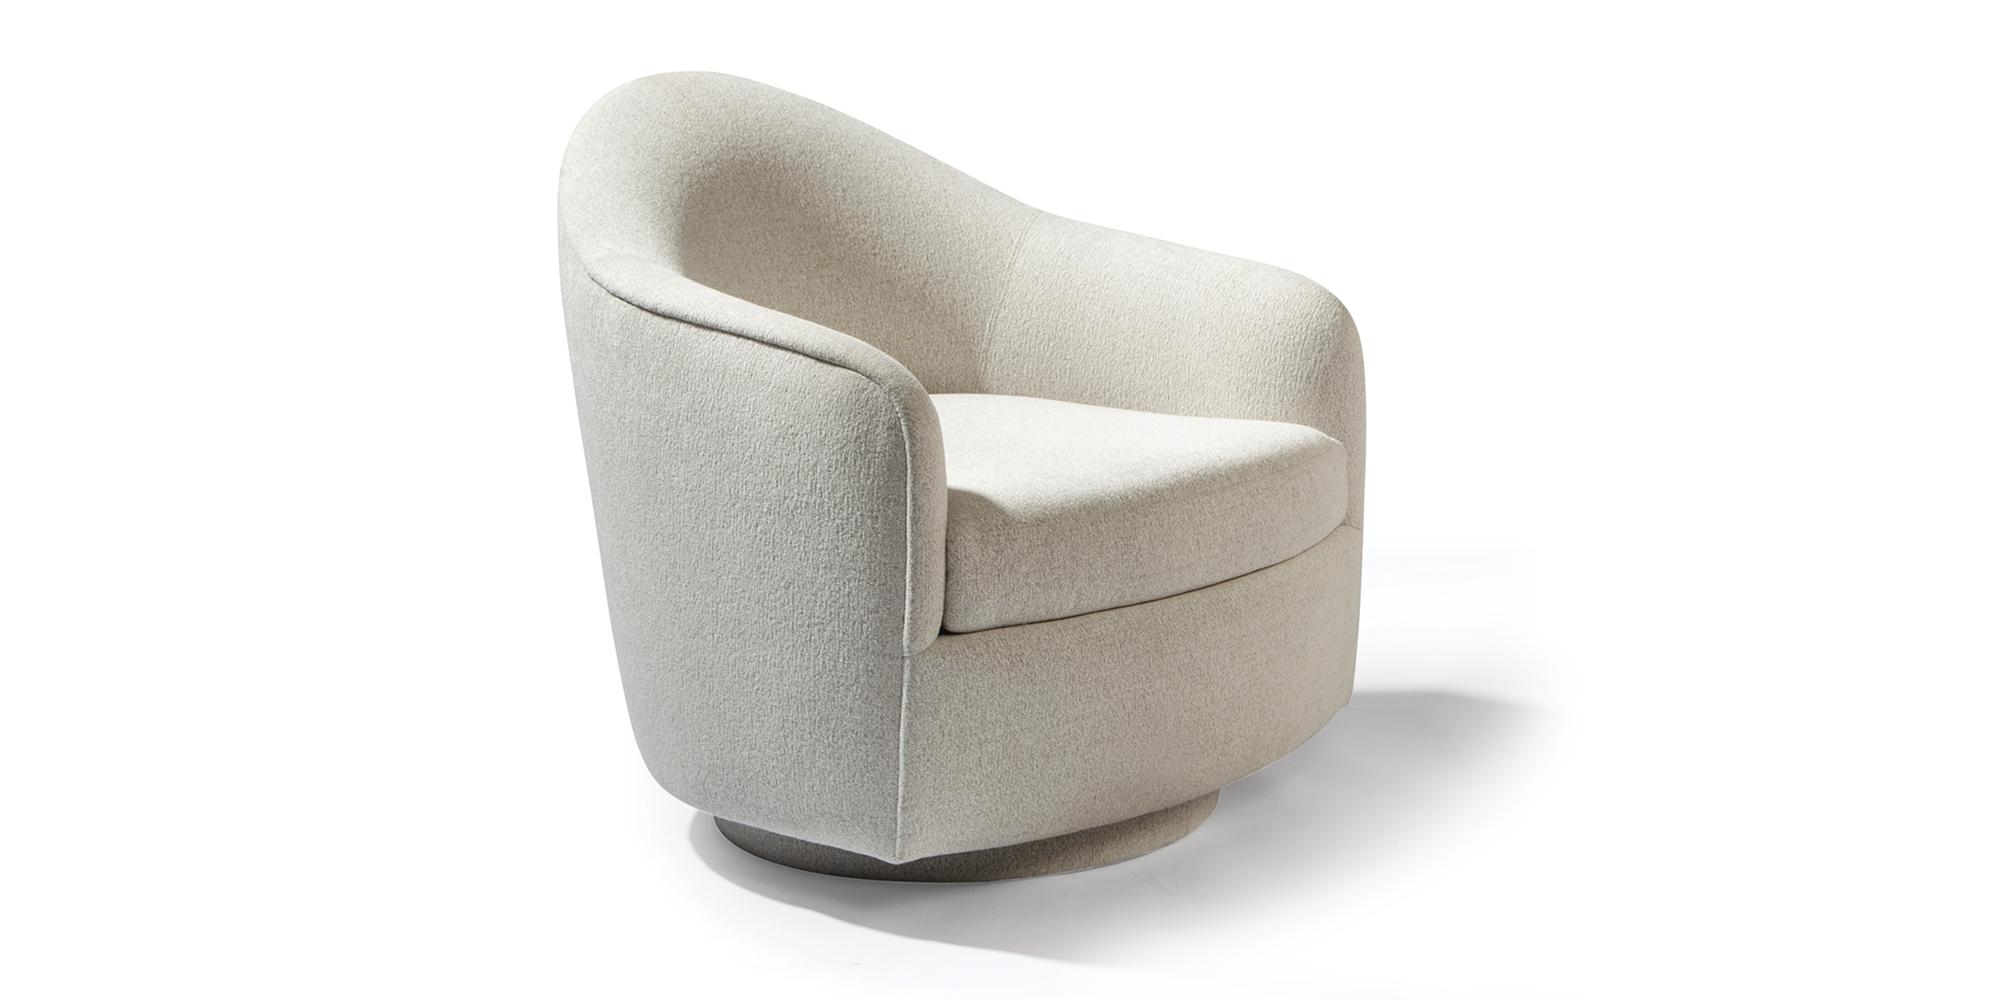 Enjoyable Milo Baughman Furniture From Thayer Coggin Unemploymentrelief Wooden Chair Designs For Living Room Unemploymentrelieforg